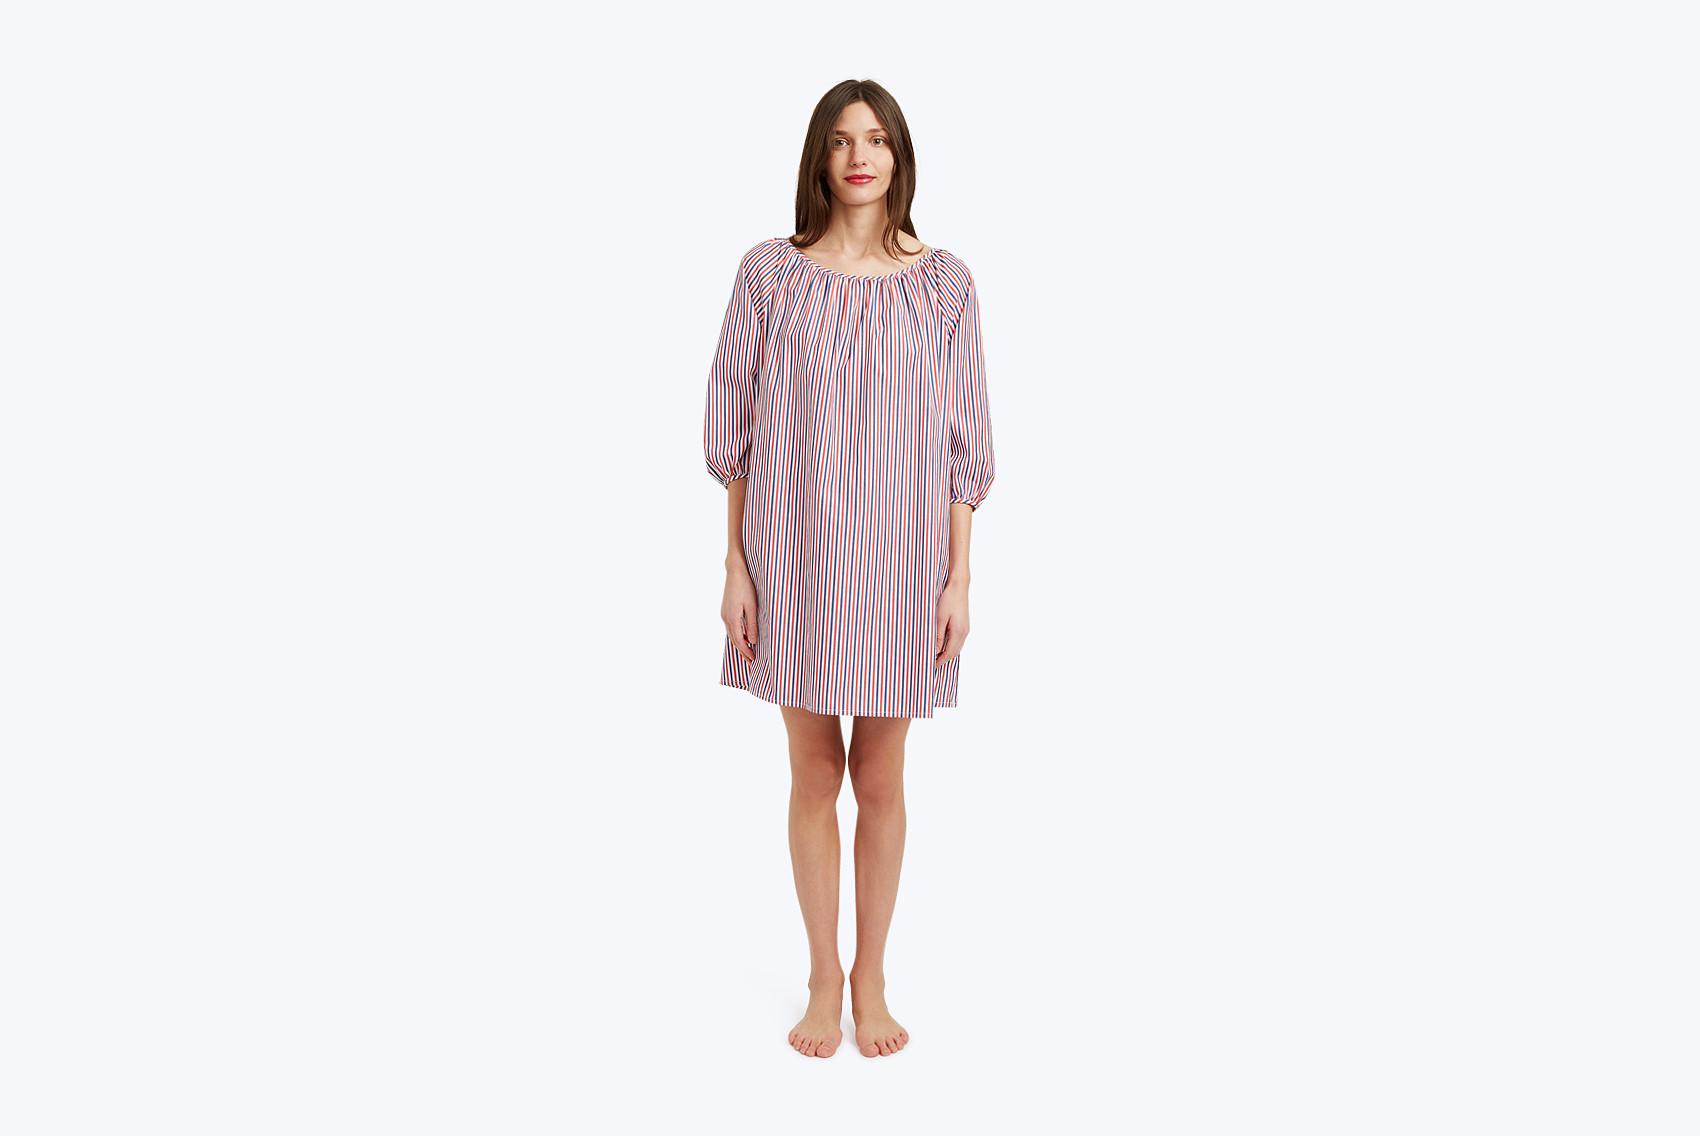 Sleepy Jones Lily Dress